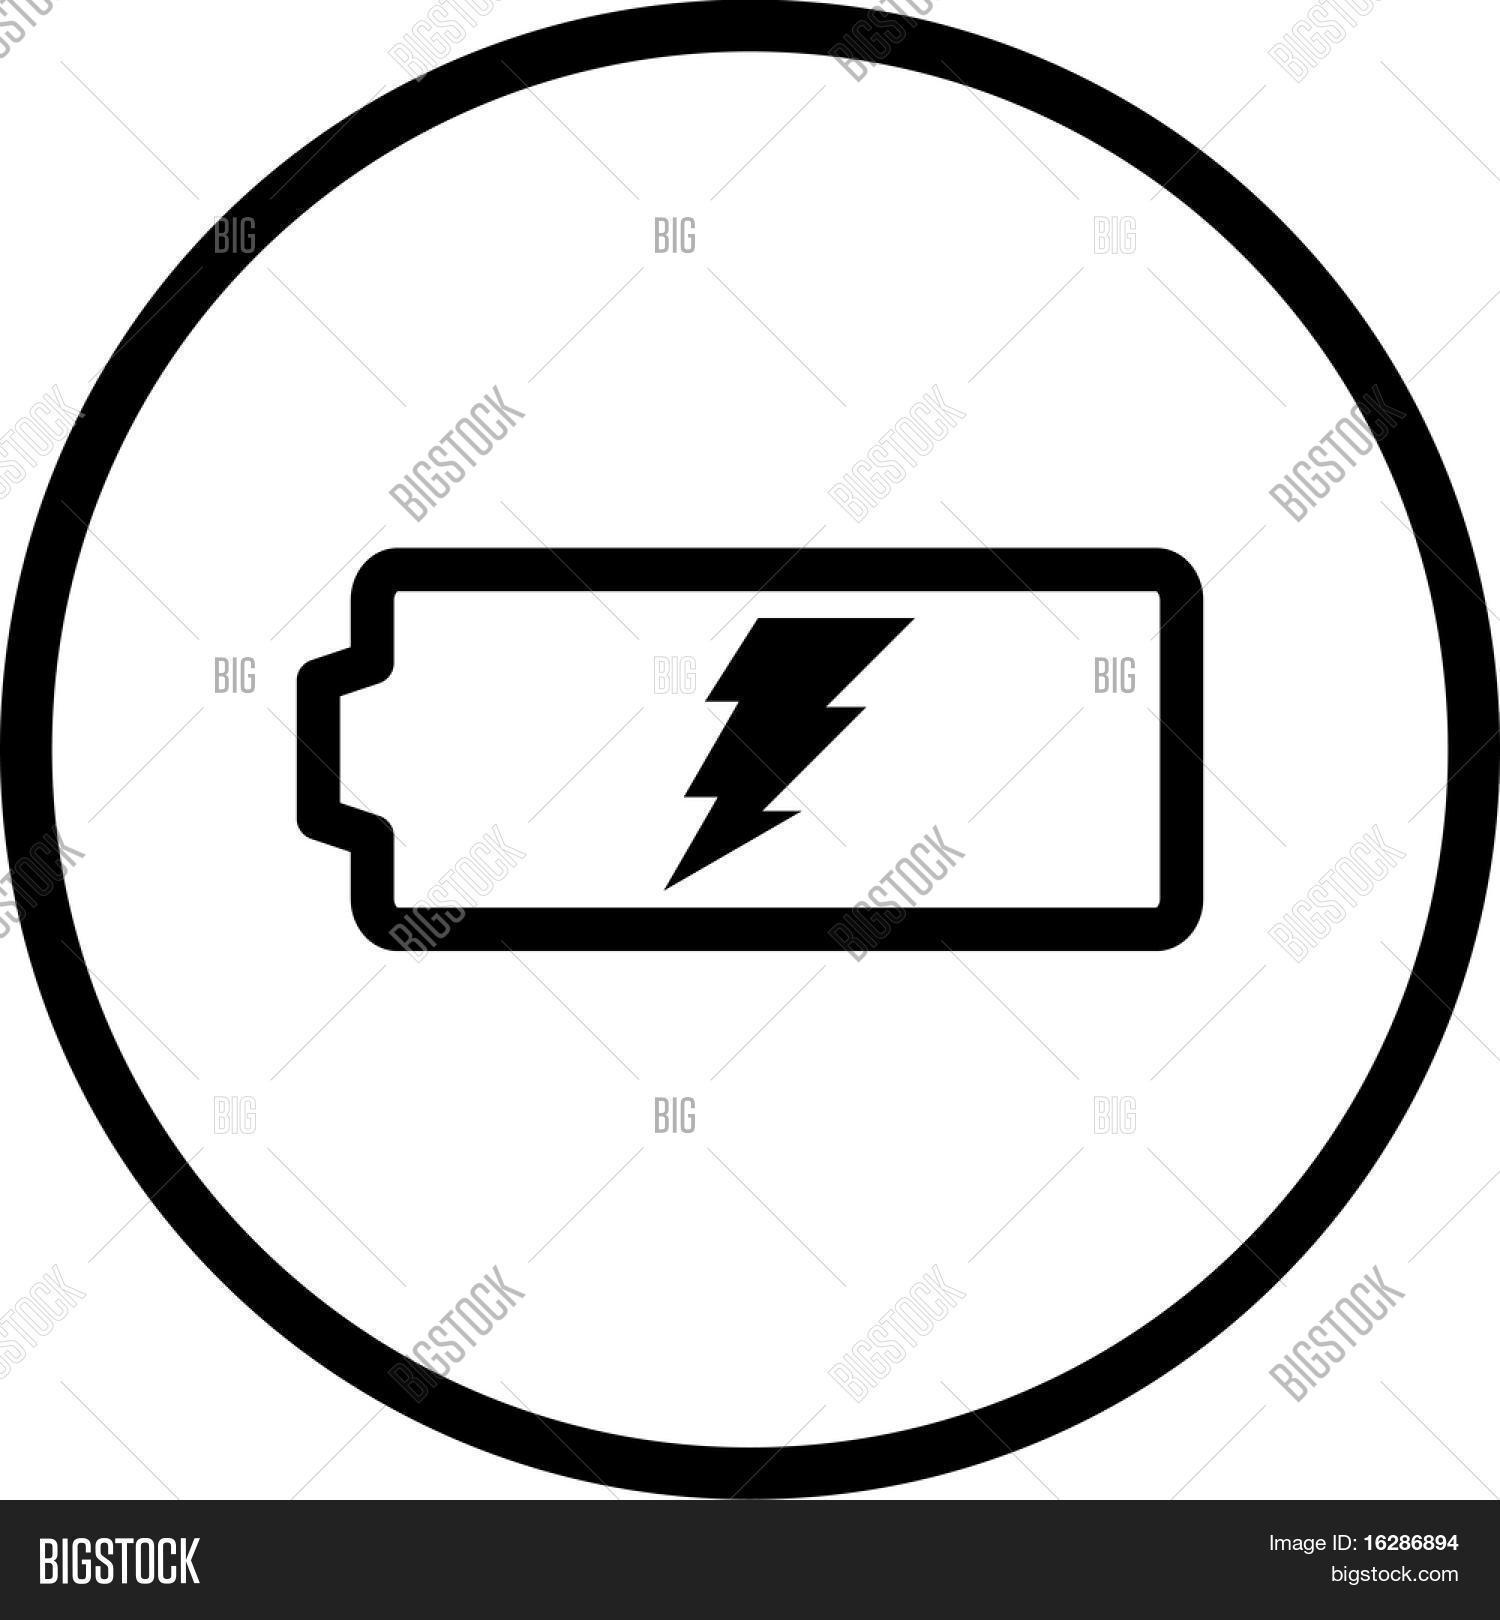 Battery Symbol Image & Photo (Free Trial) | Bigstock